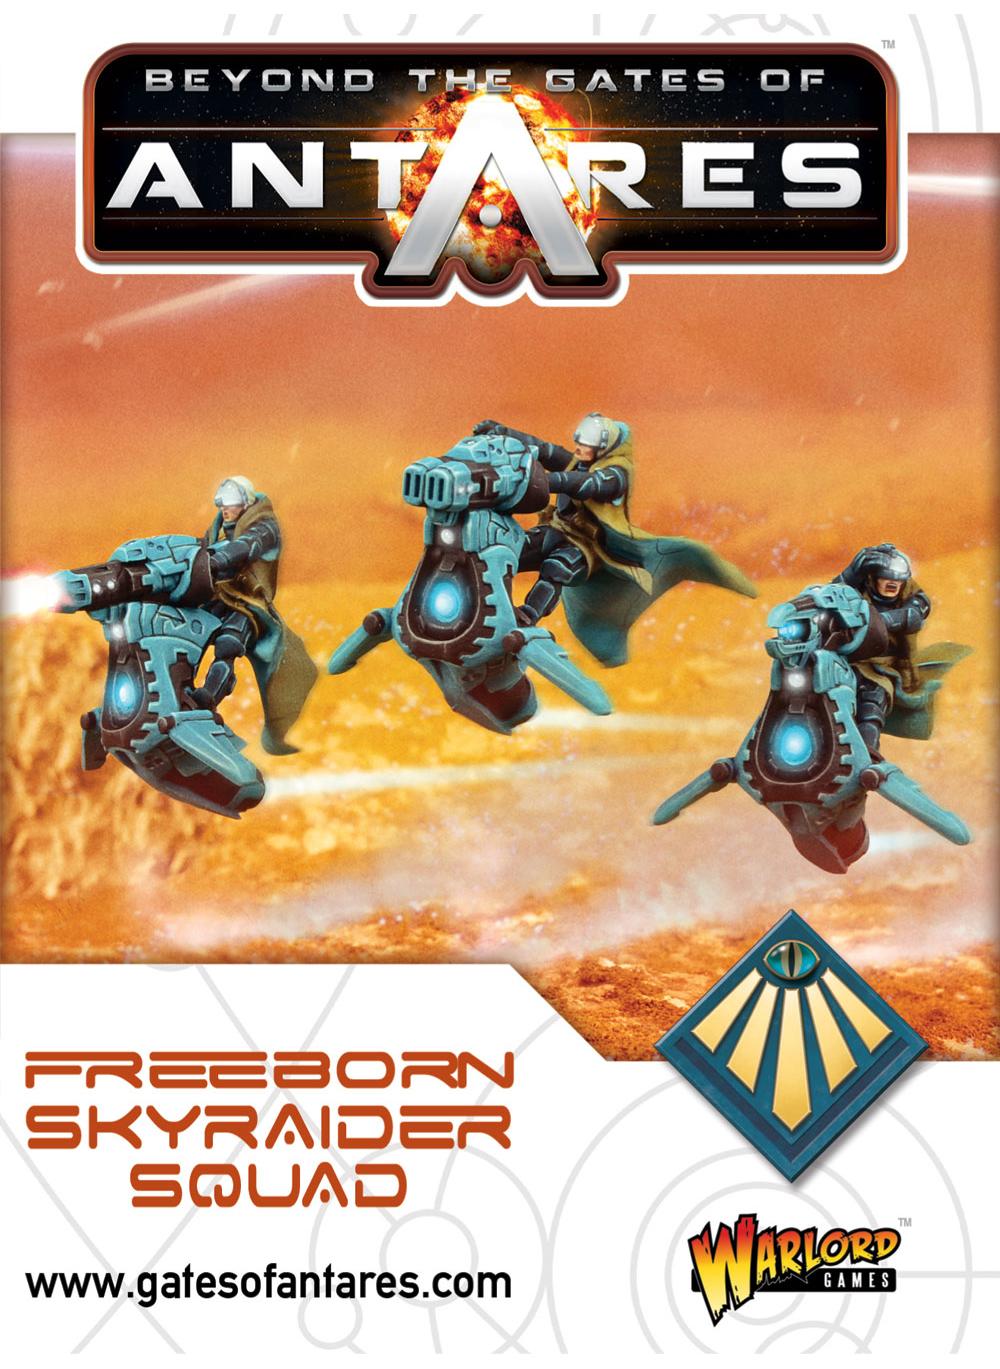 Gates of Antares Freeborn Sky Raider Squad